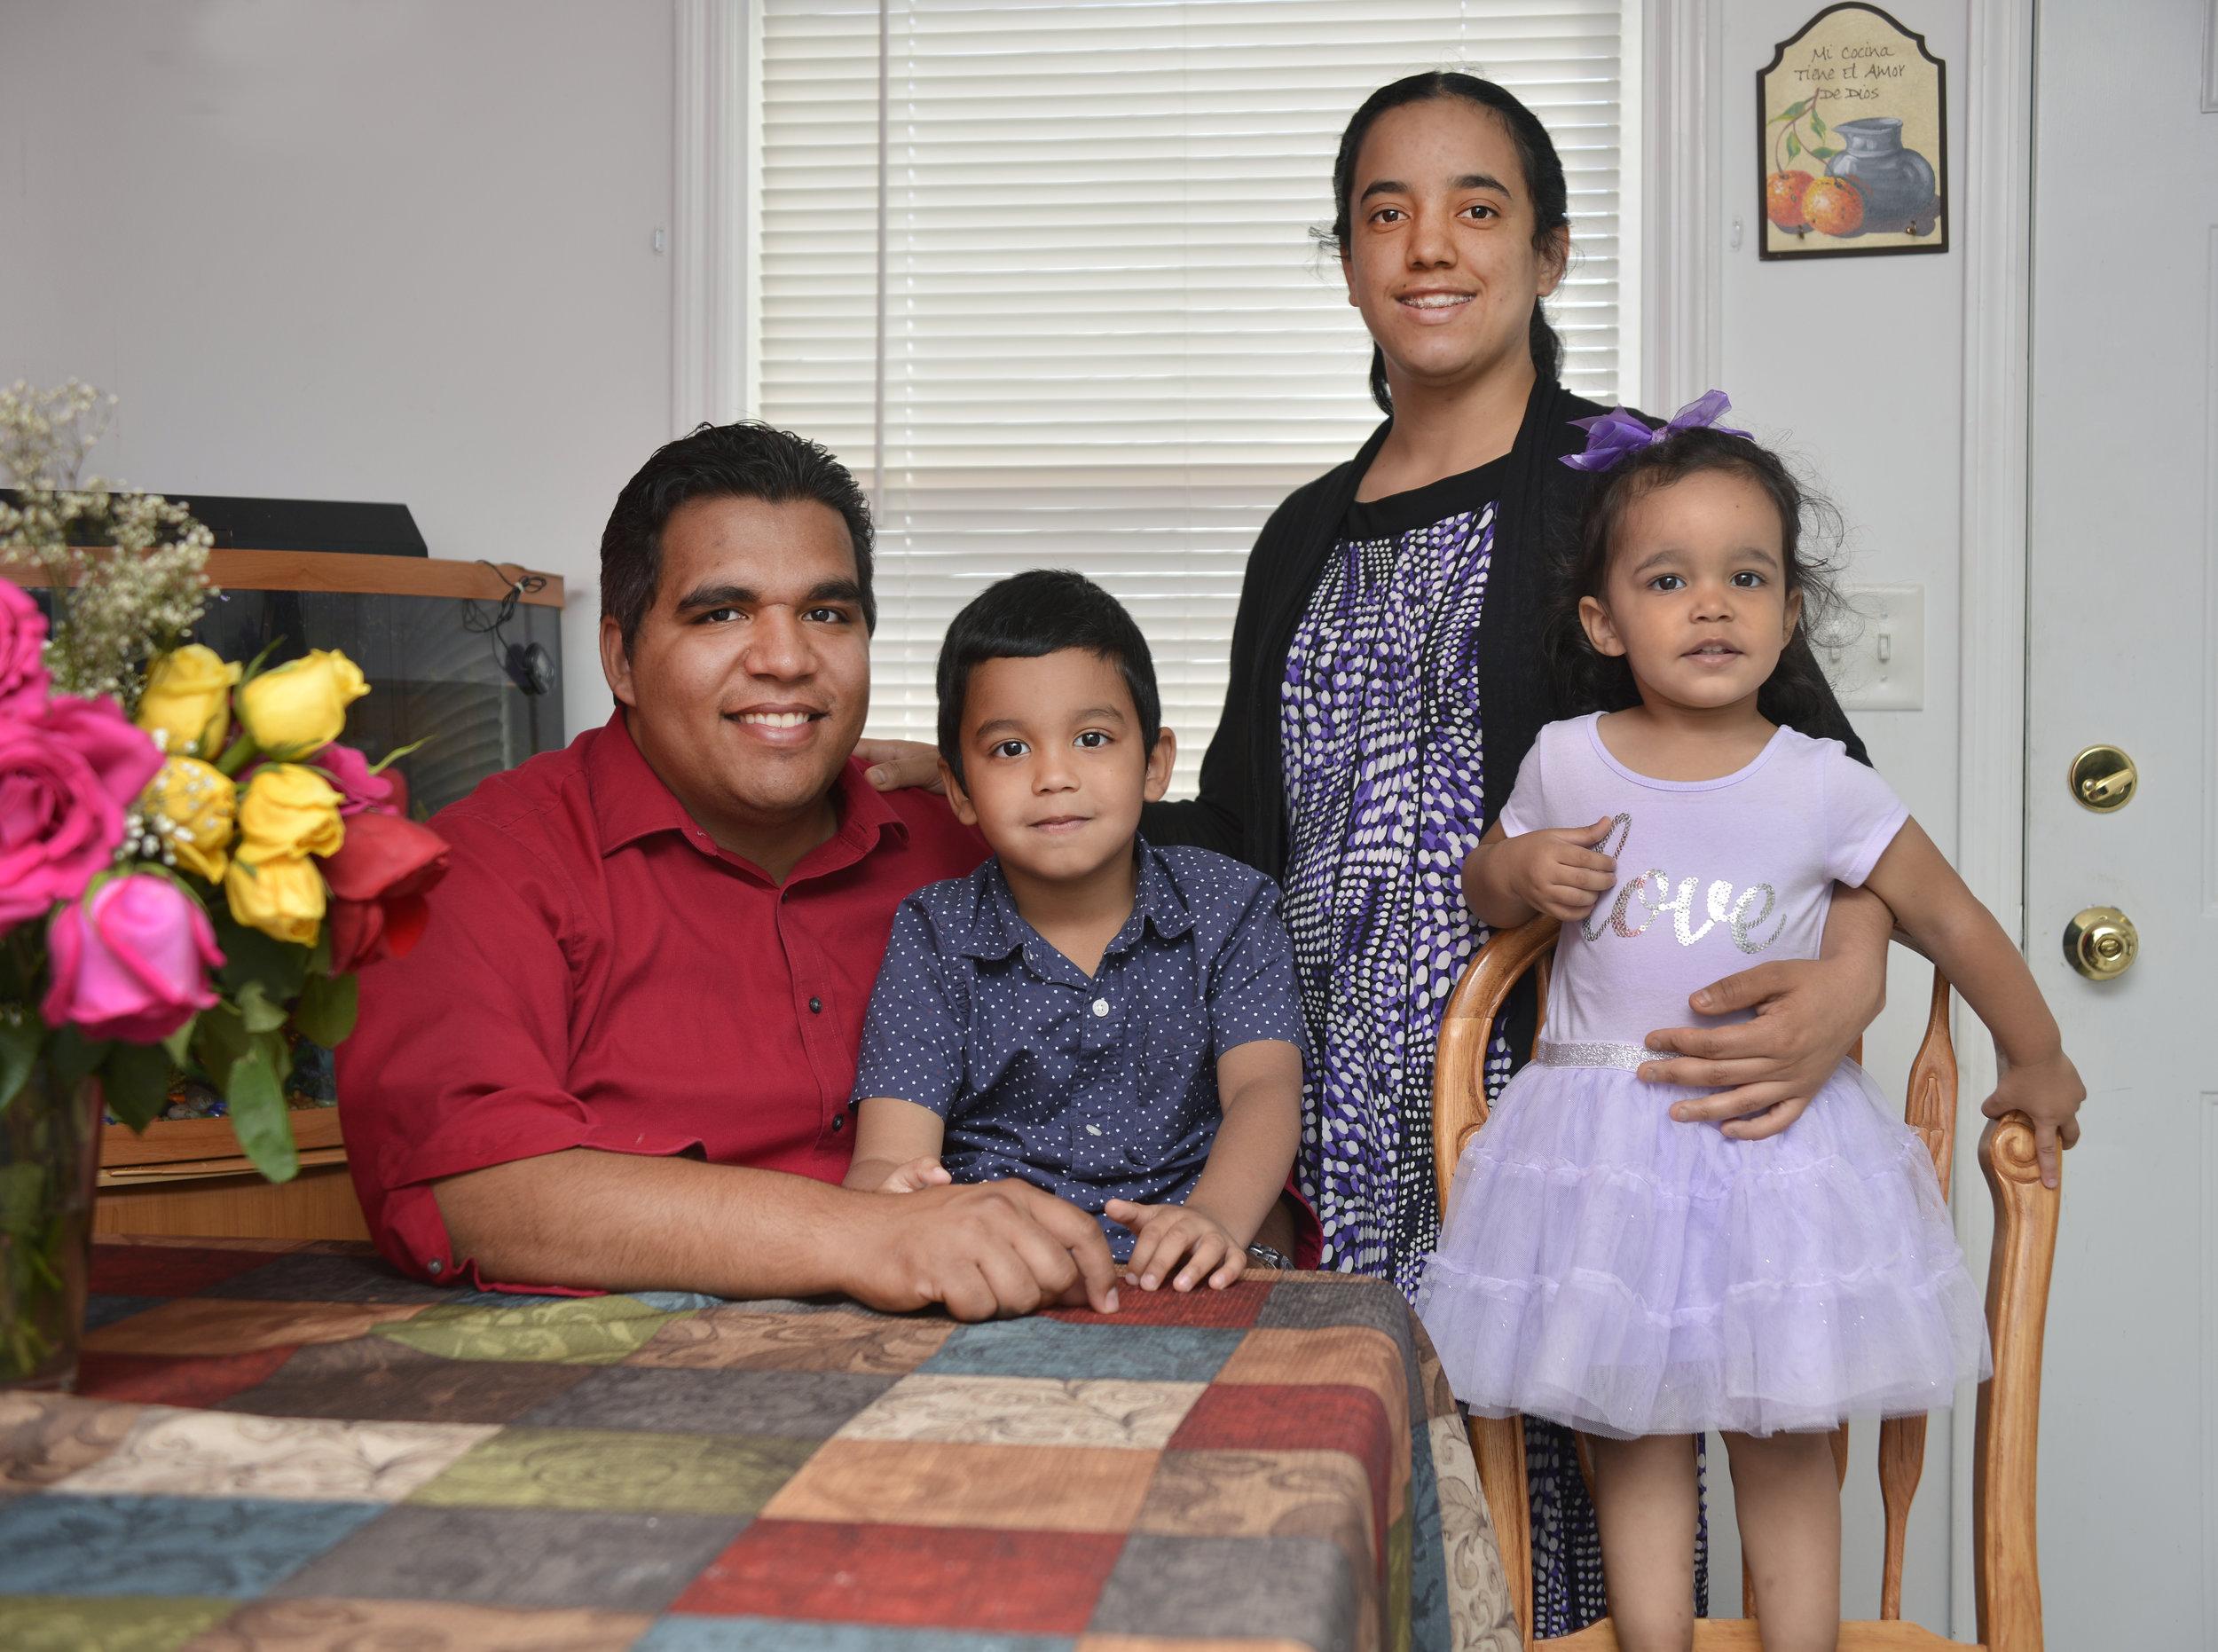 Araujo Family 031.JPG